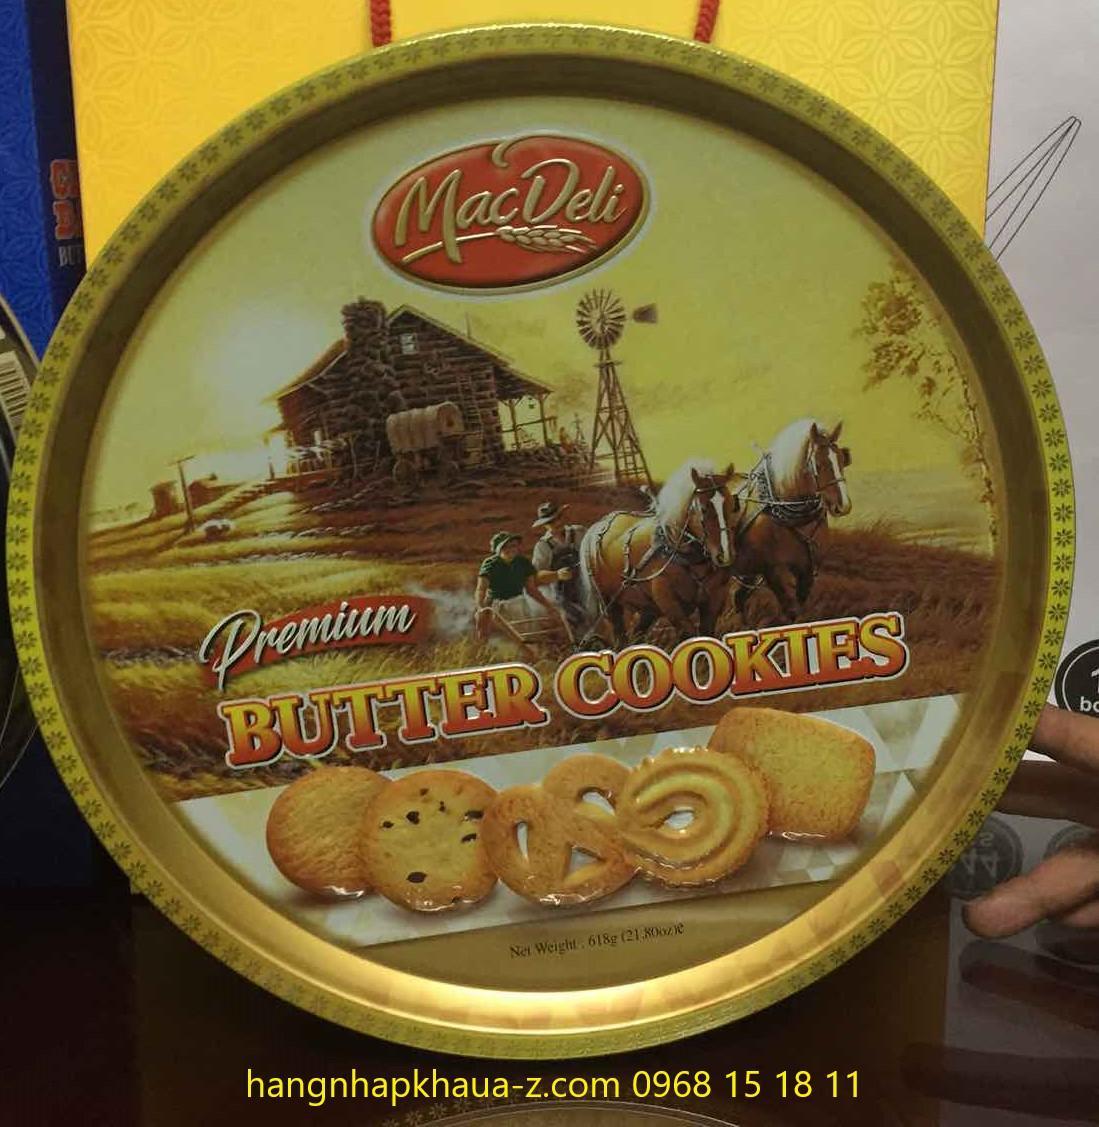 Bánh Macdeli Butter Cookies618g